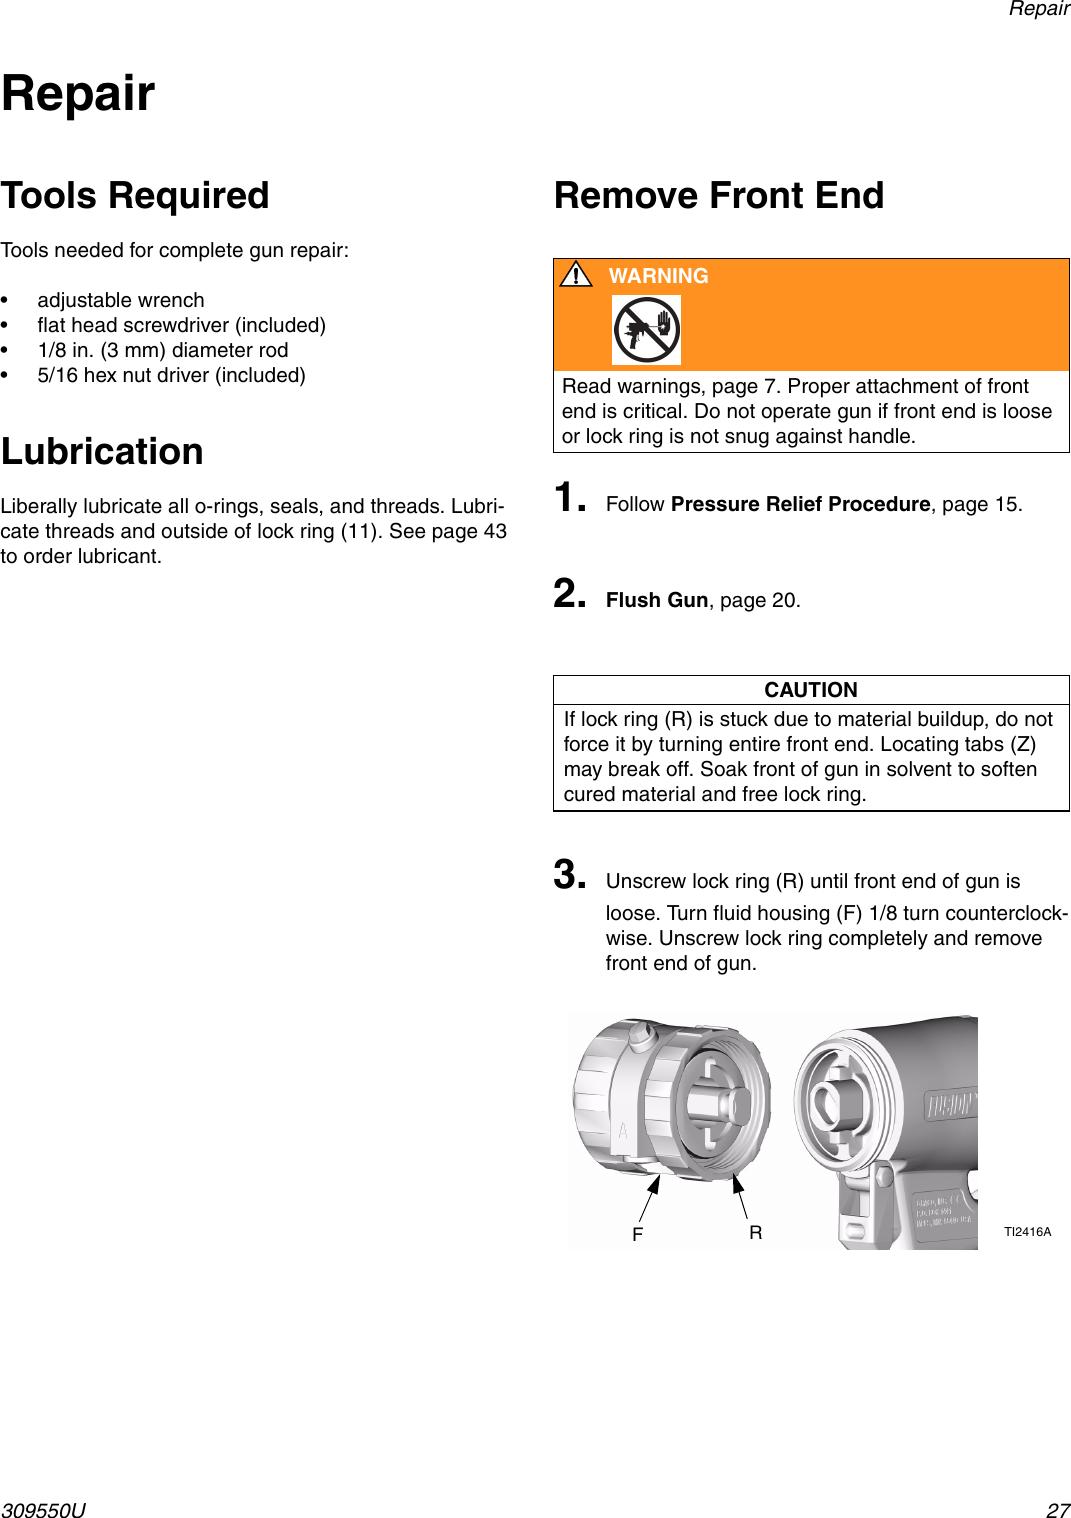 Graco Fusion 309550U Users Manual 309550U, Plural Component